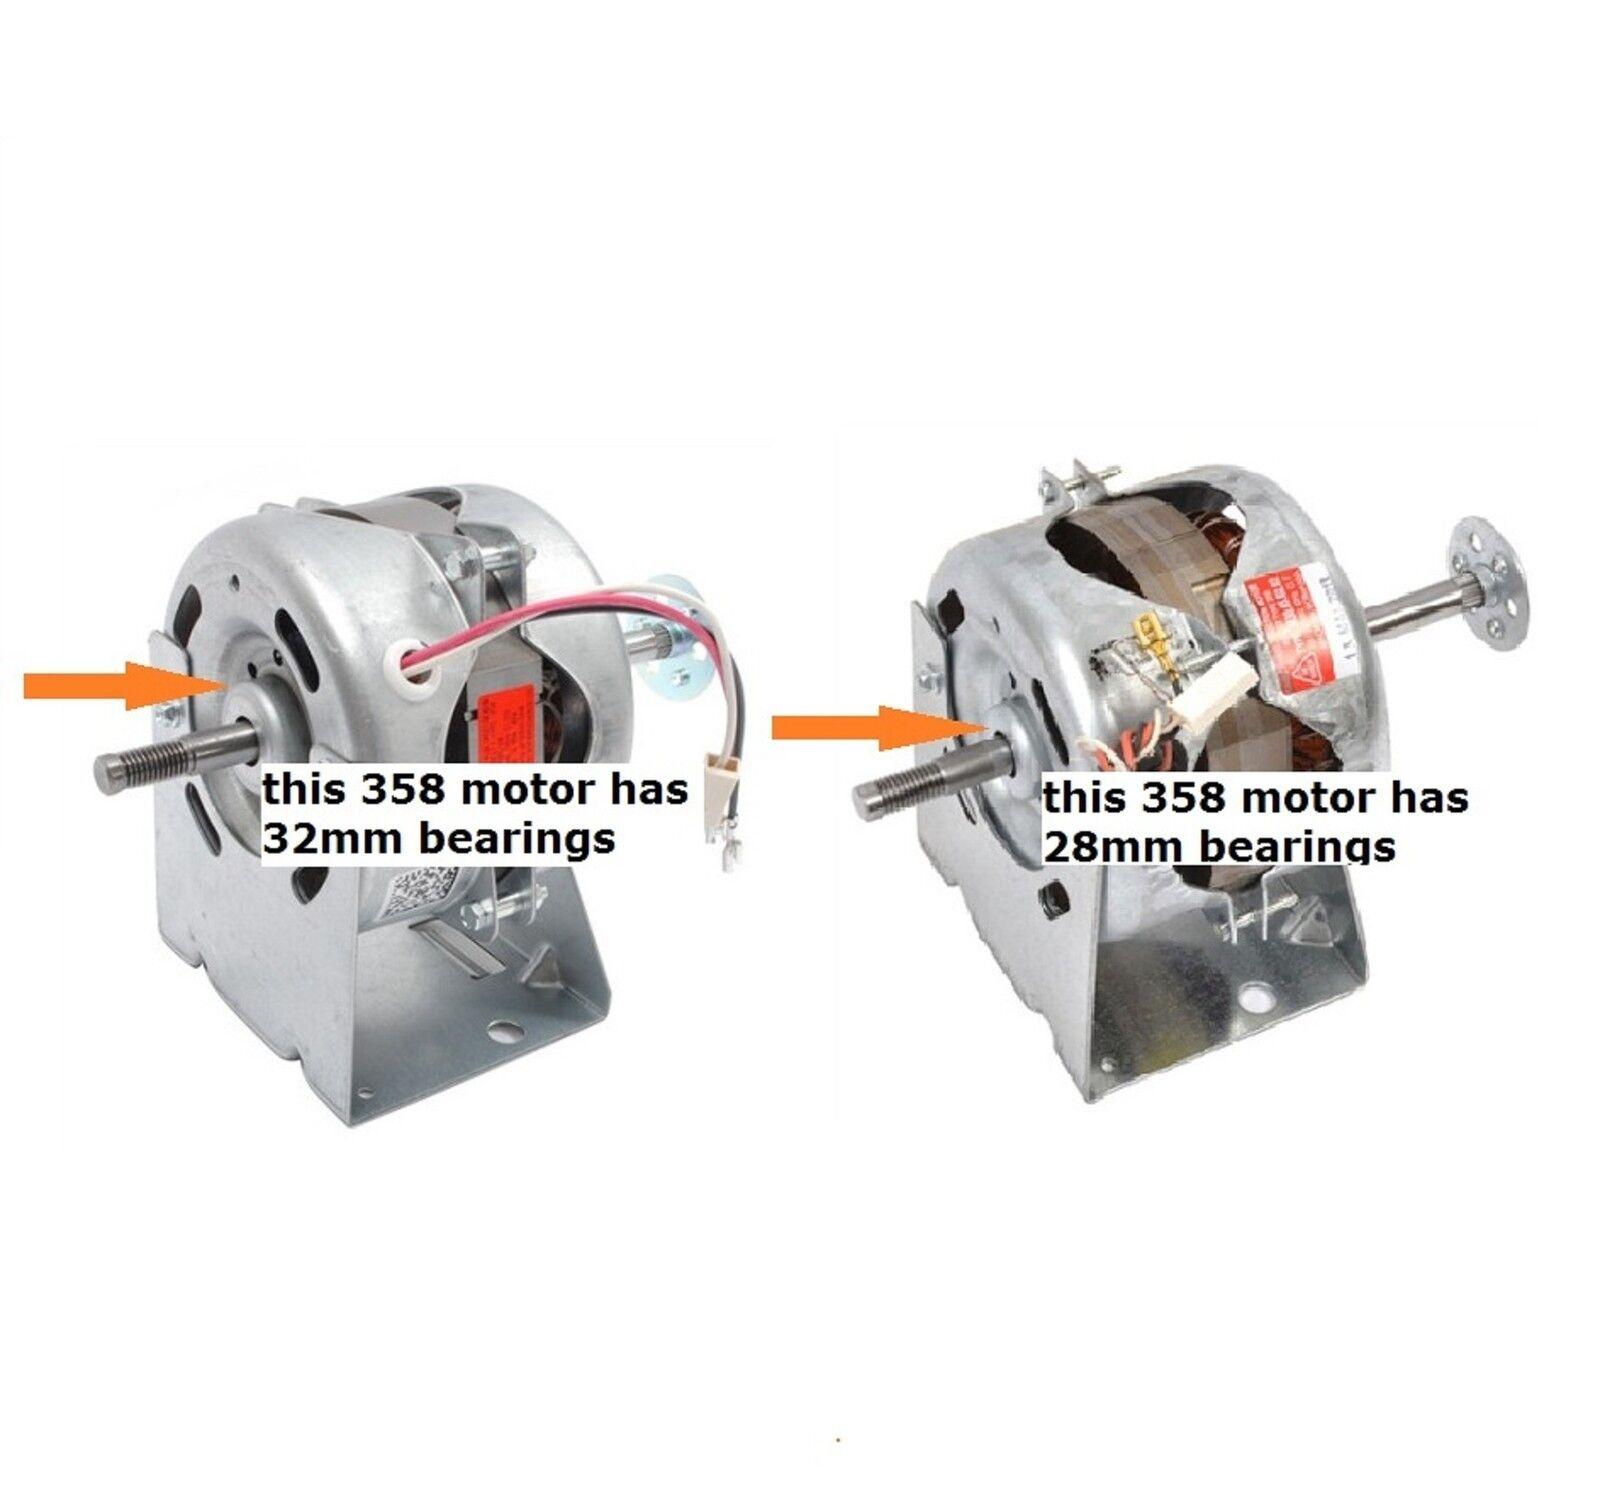 Motor 358 Merloni Welling kit Indesit Group